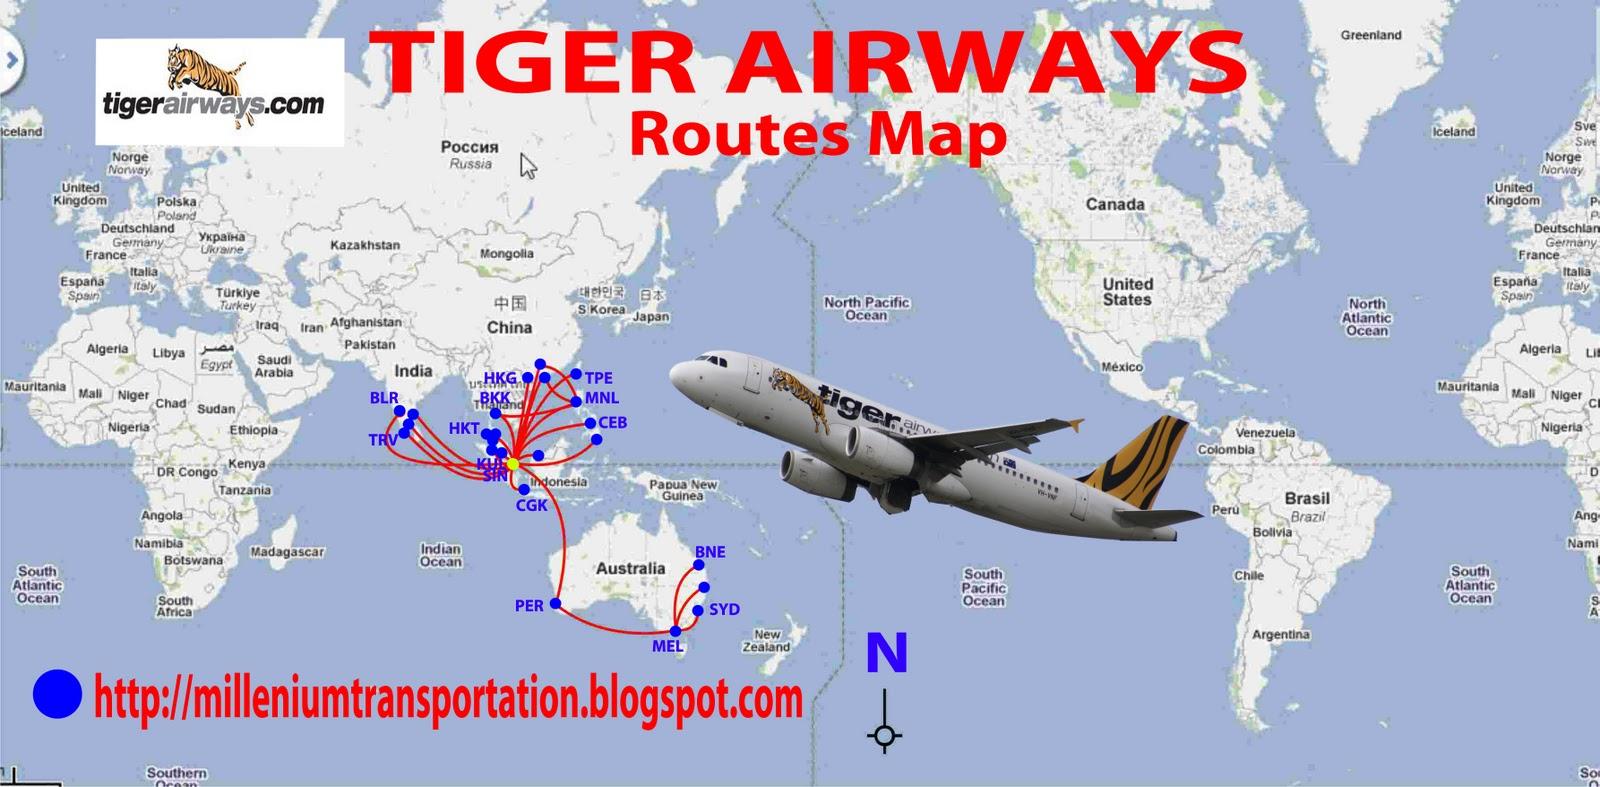 tiger airways routes map figure via milleniumtransportation